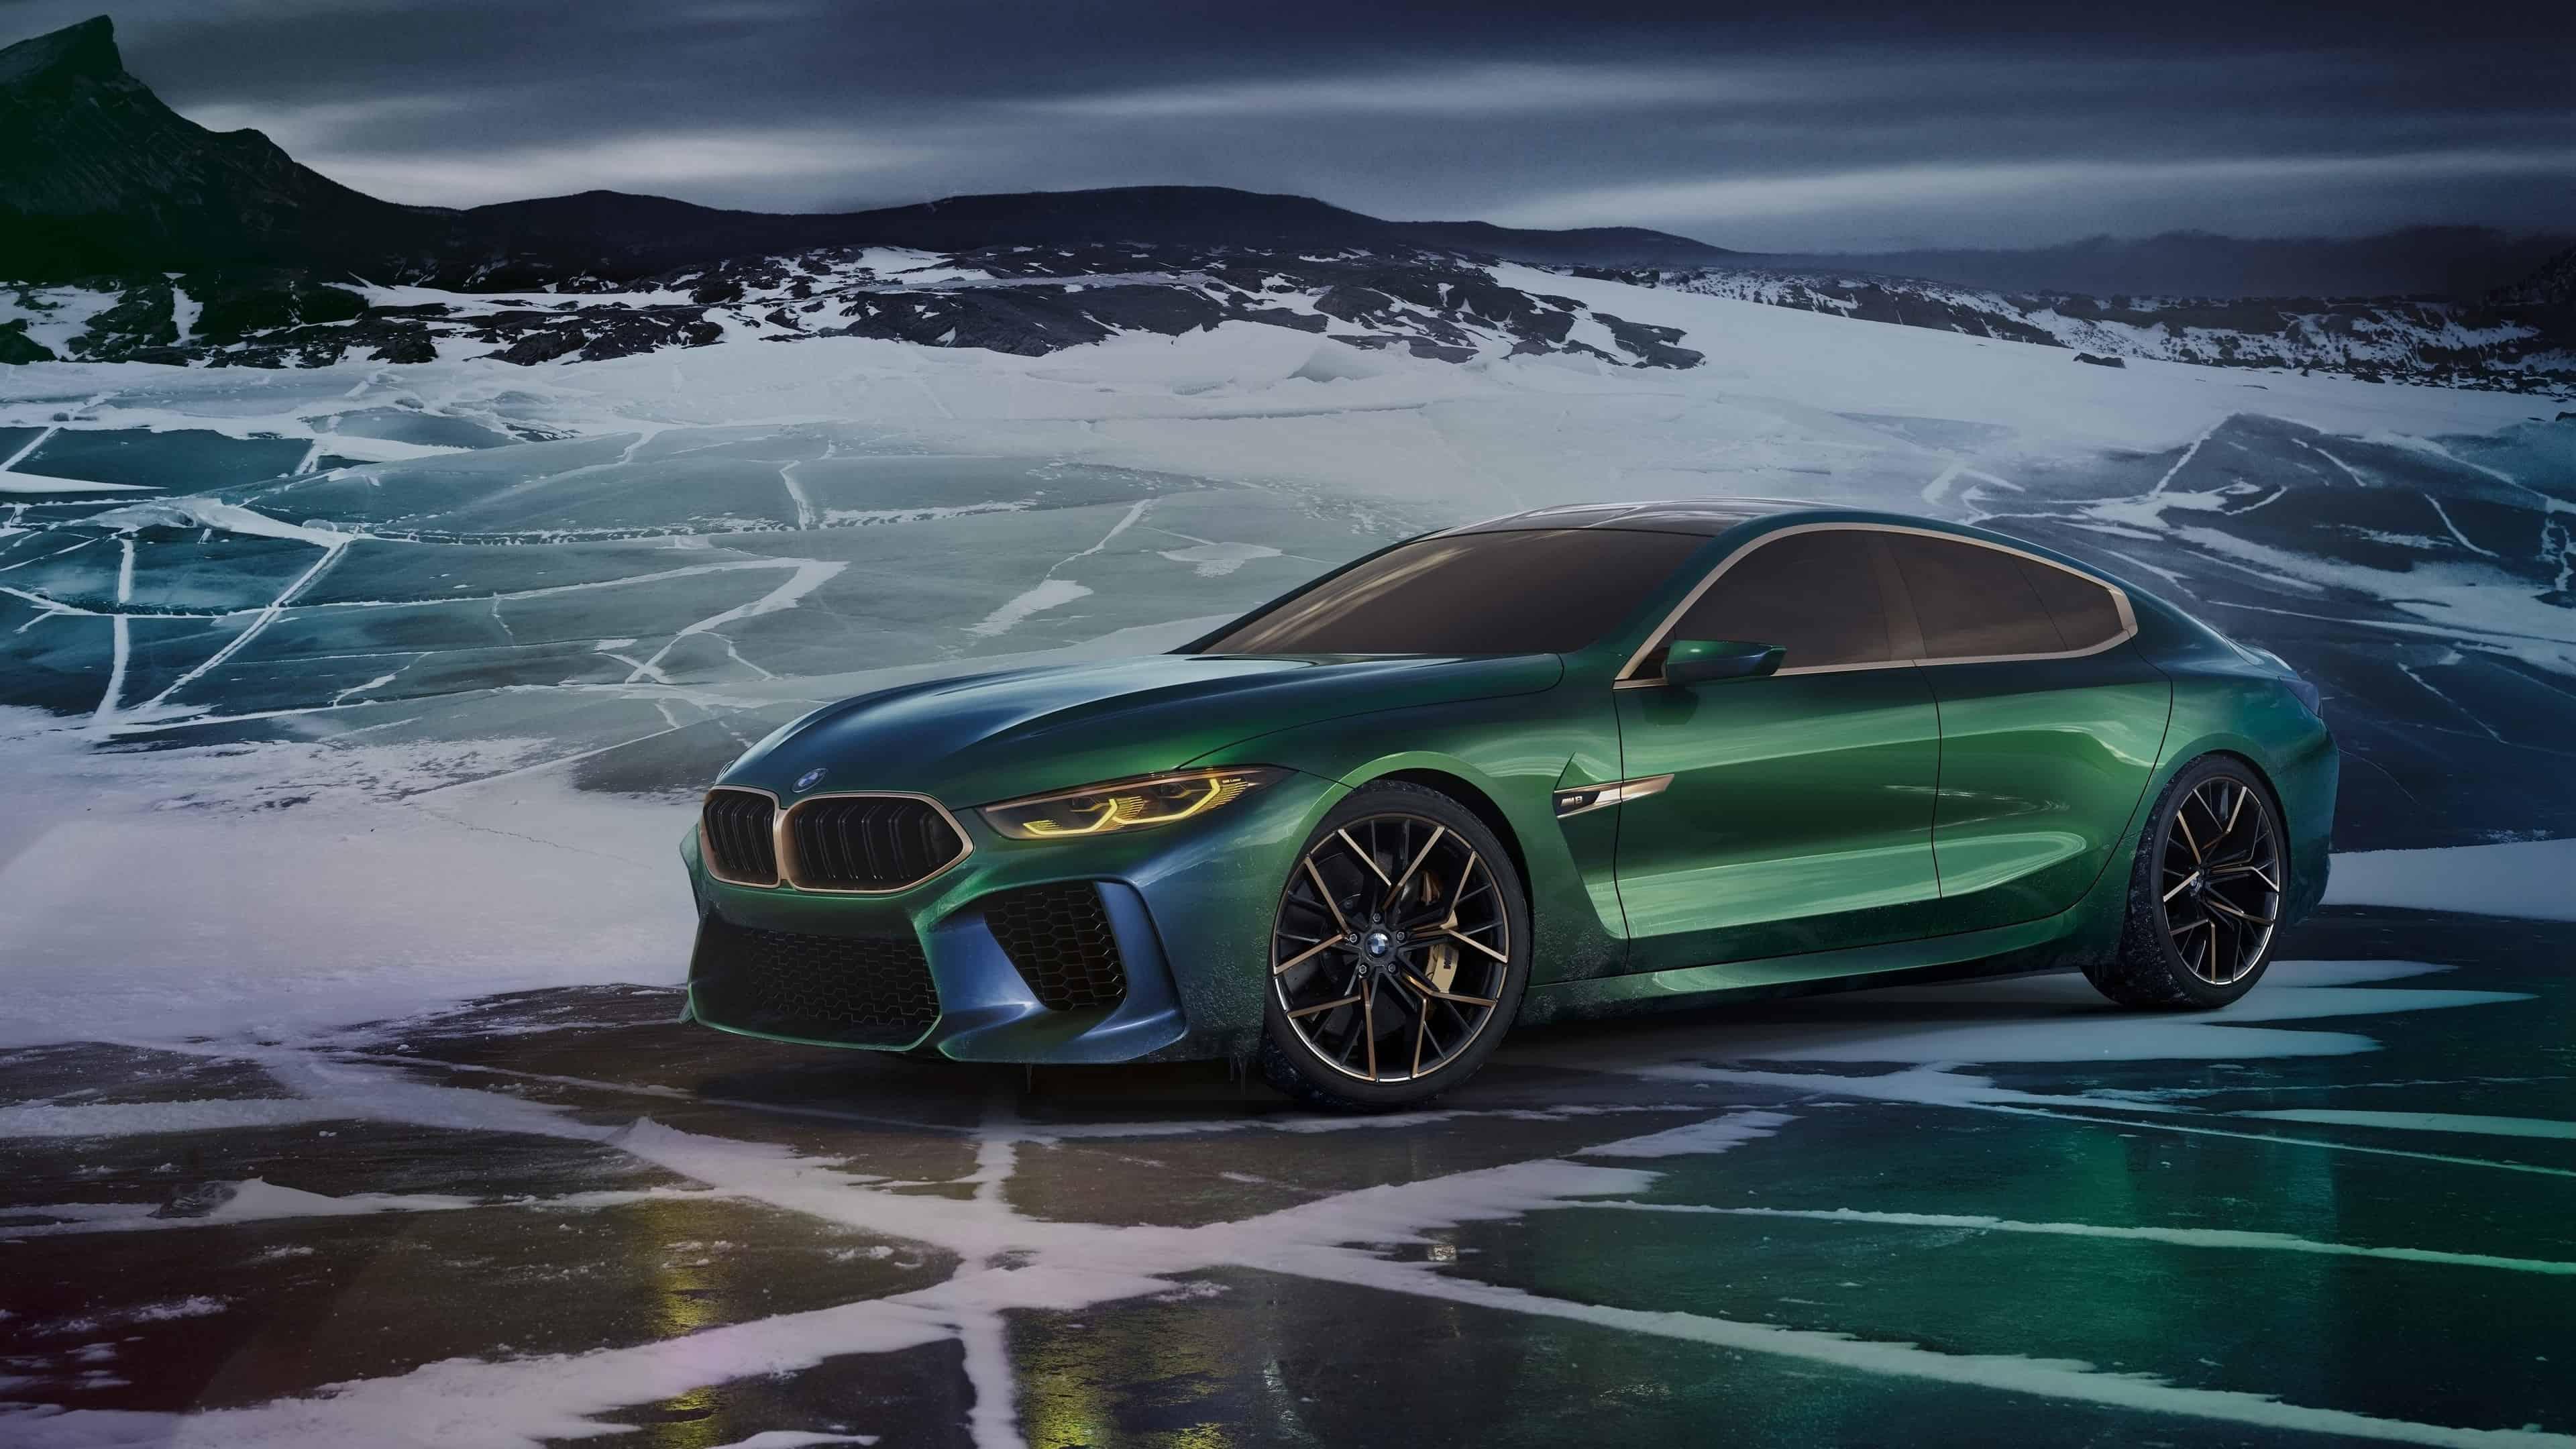 Cars Wallpaper Hd Wallpaper Bmw M8 Gran Coupe Concept Green Uhd 4k Wallpaper Pixelz